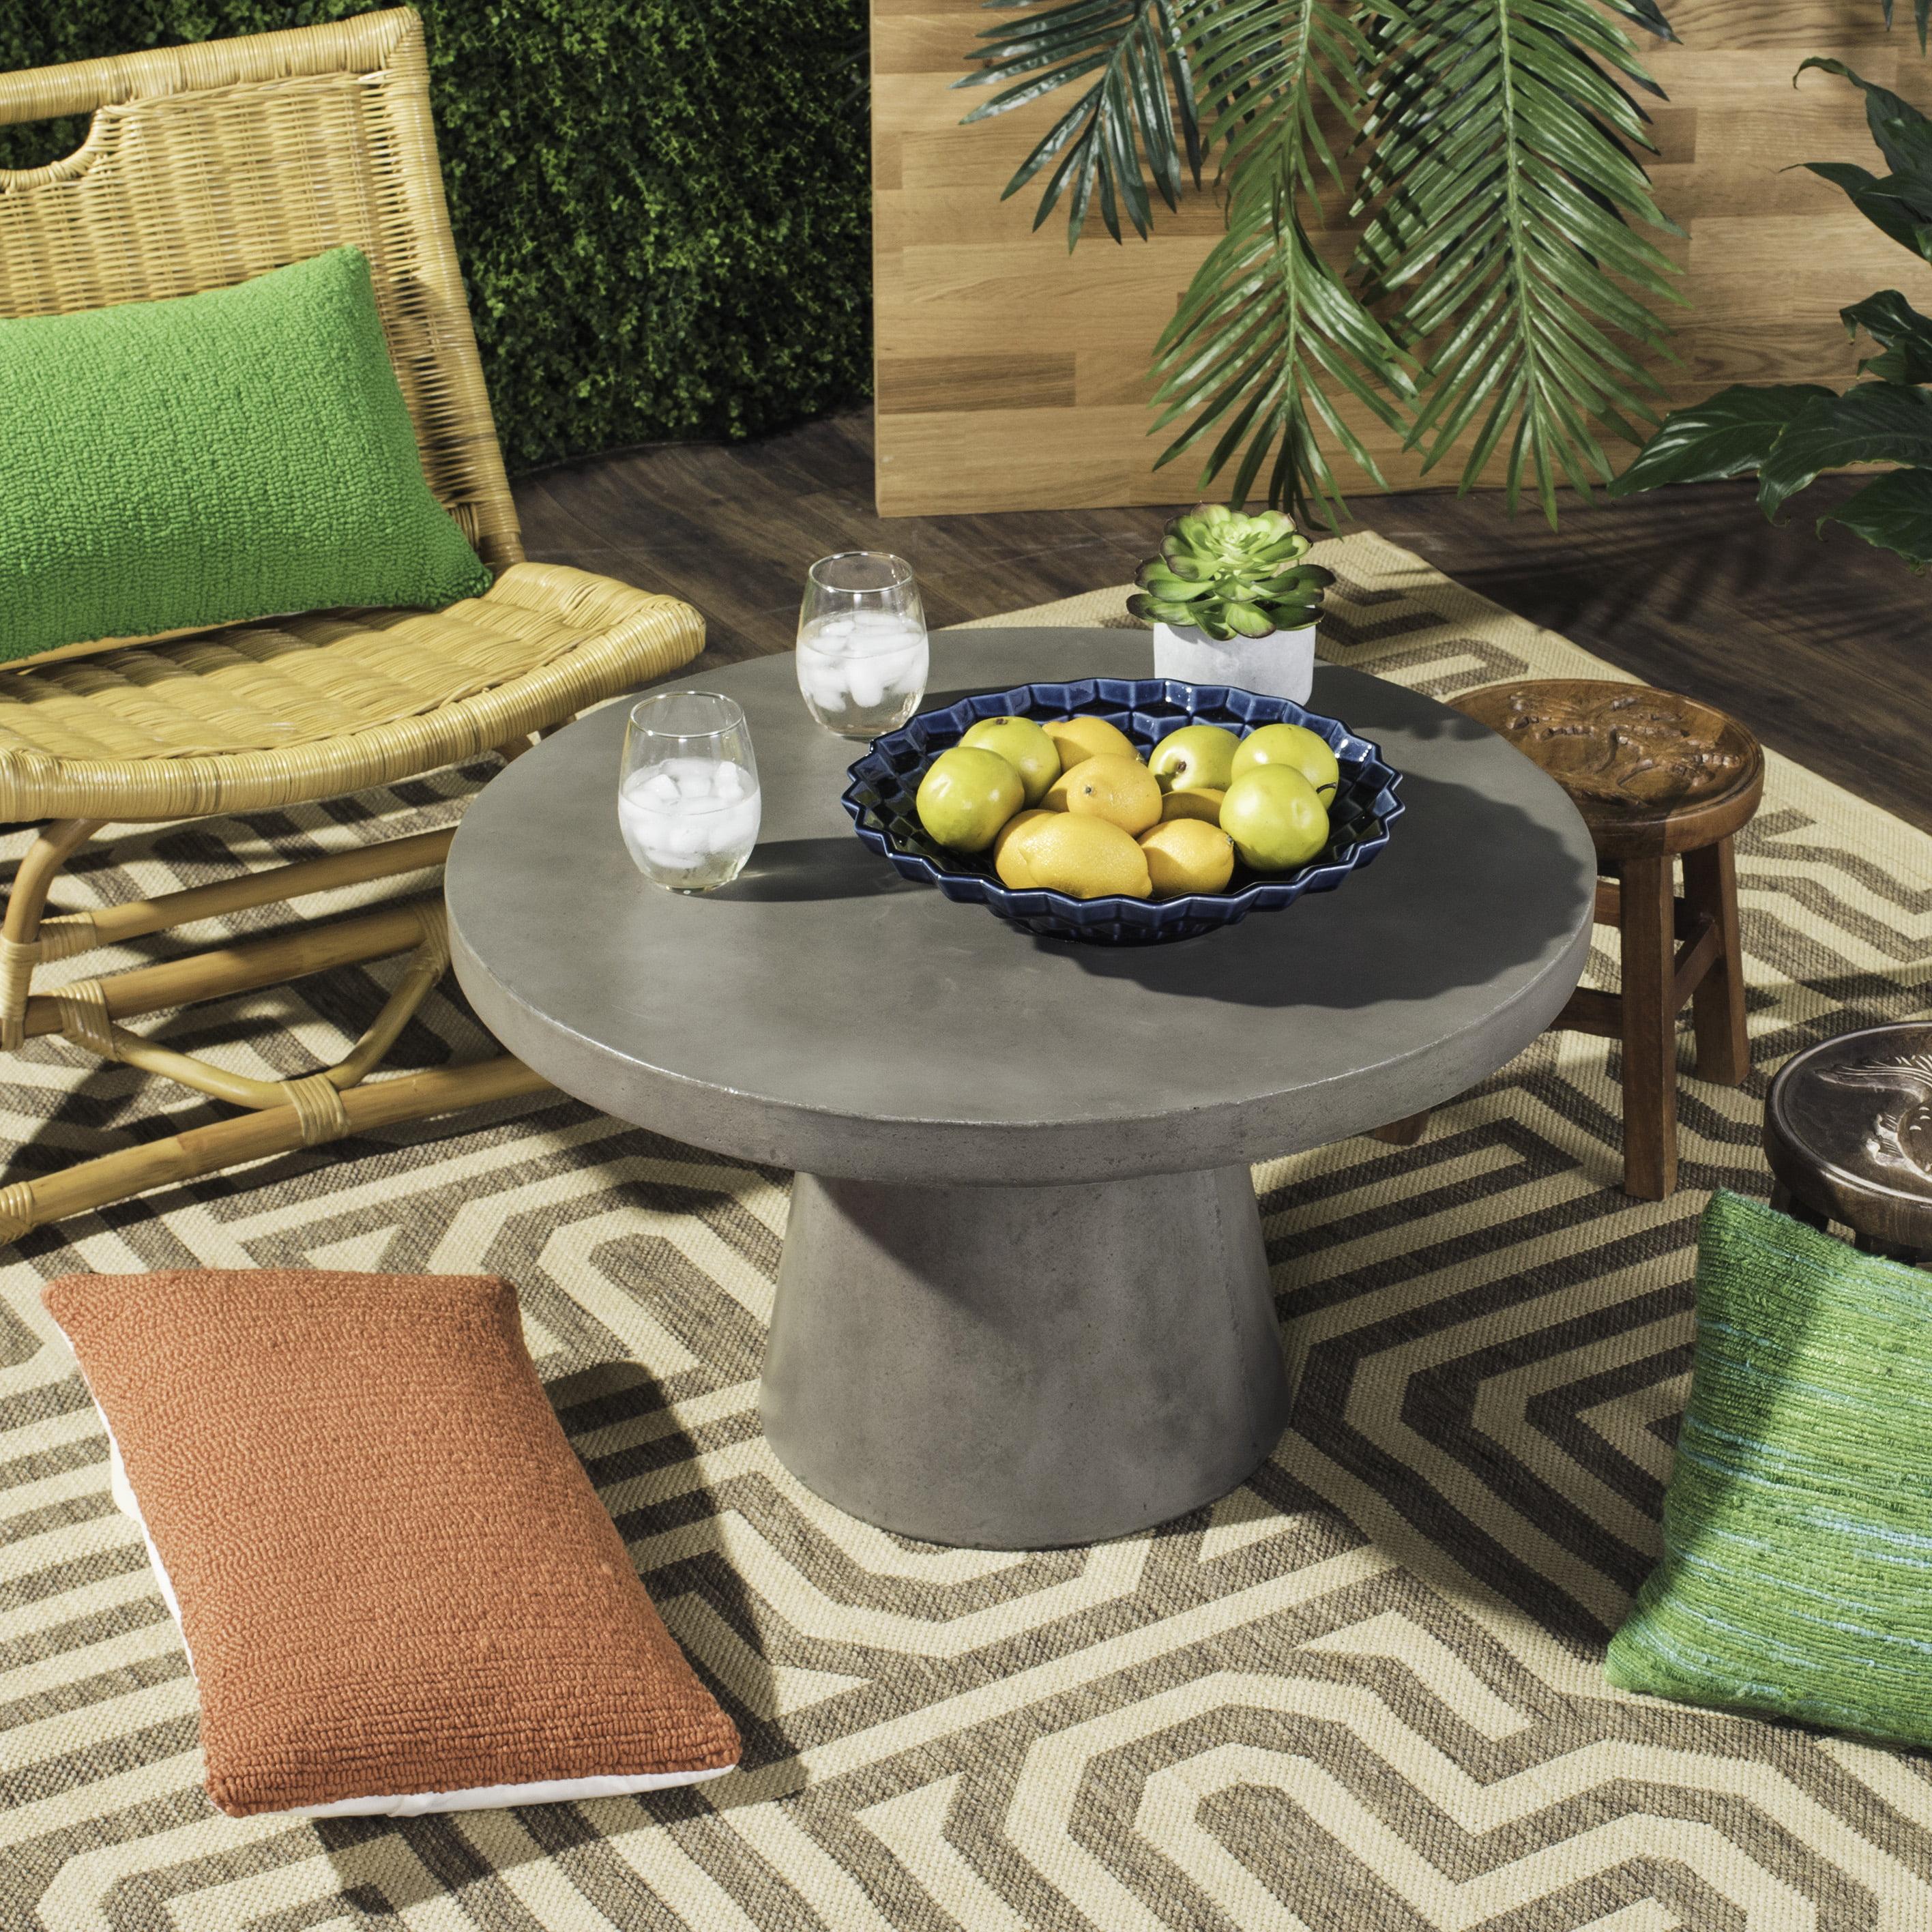 Safavieh Delfia Indoor Outdoor Modern Concrete Round Coffee Table by Safavieh